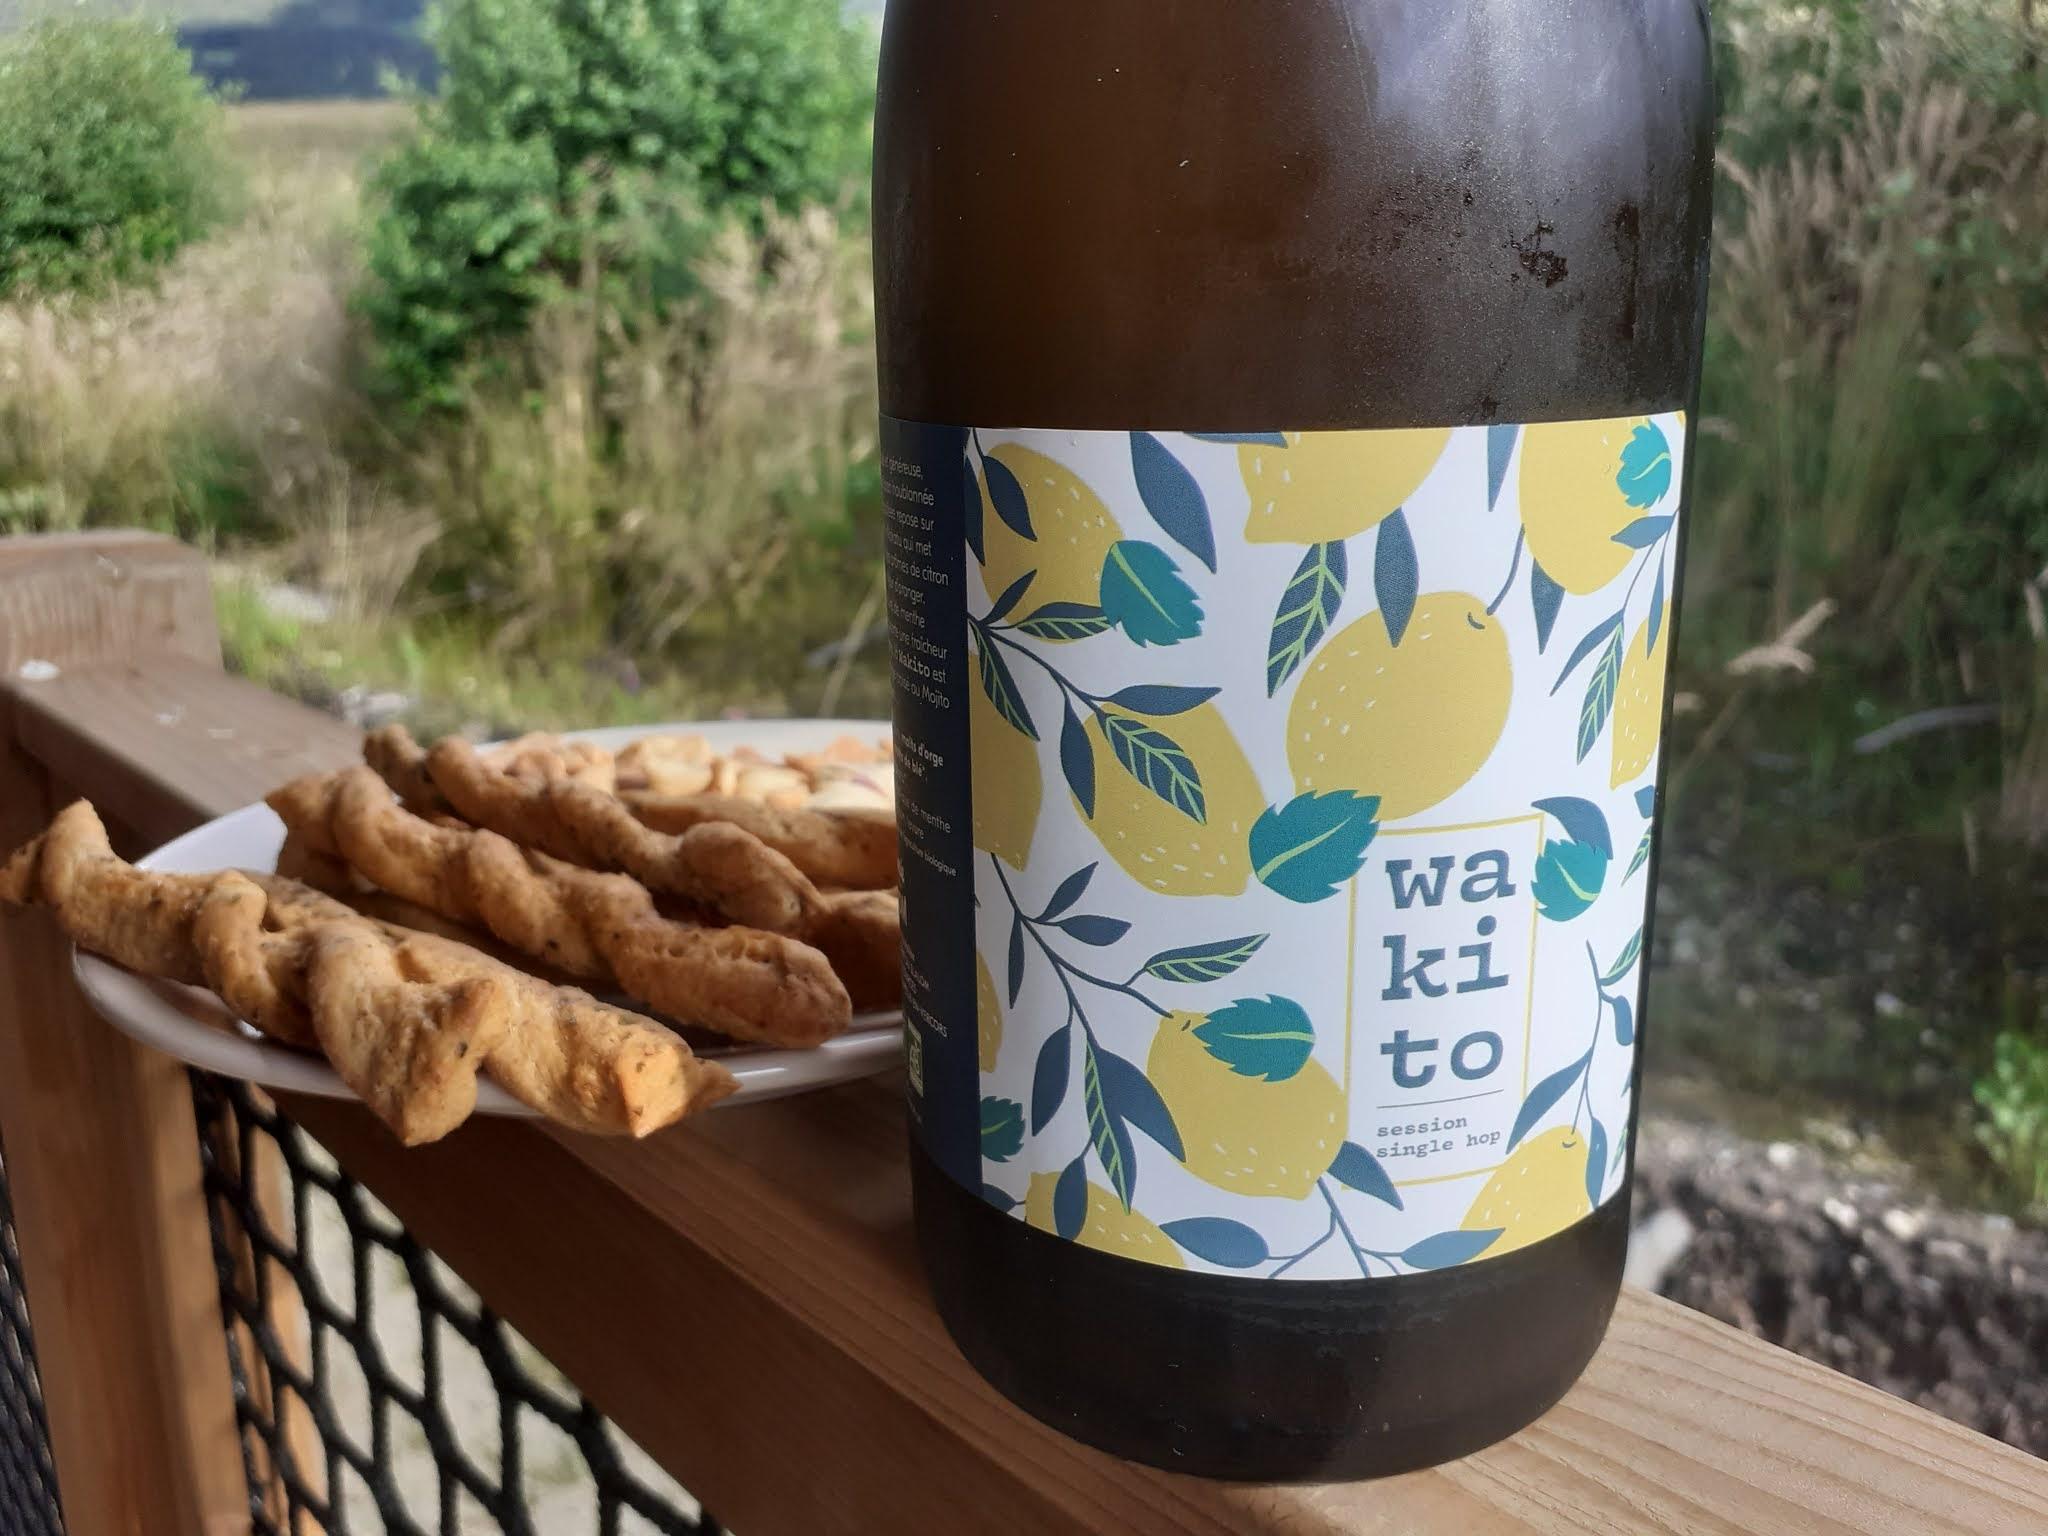 Bière Wakito - Brasserie du Slalom - La Chapelle-en-Vercors